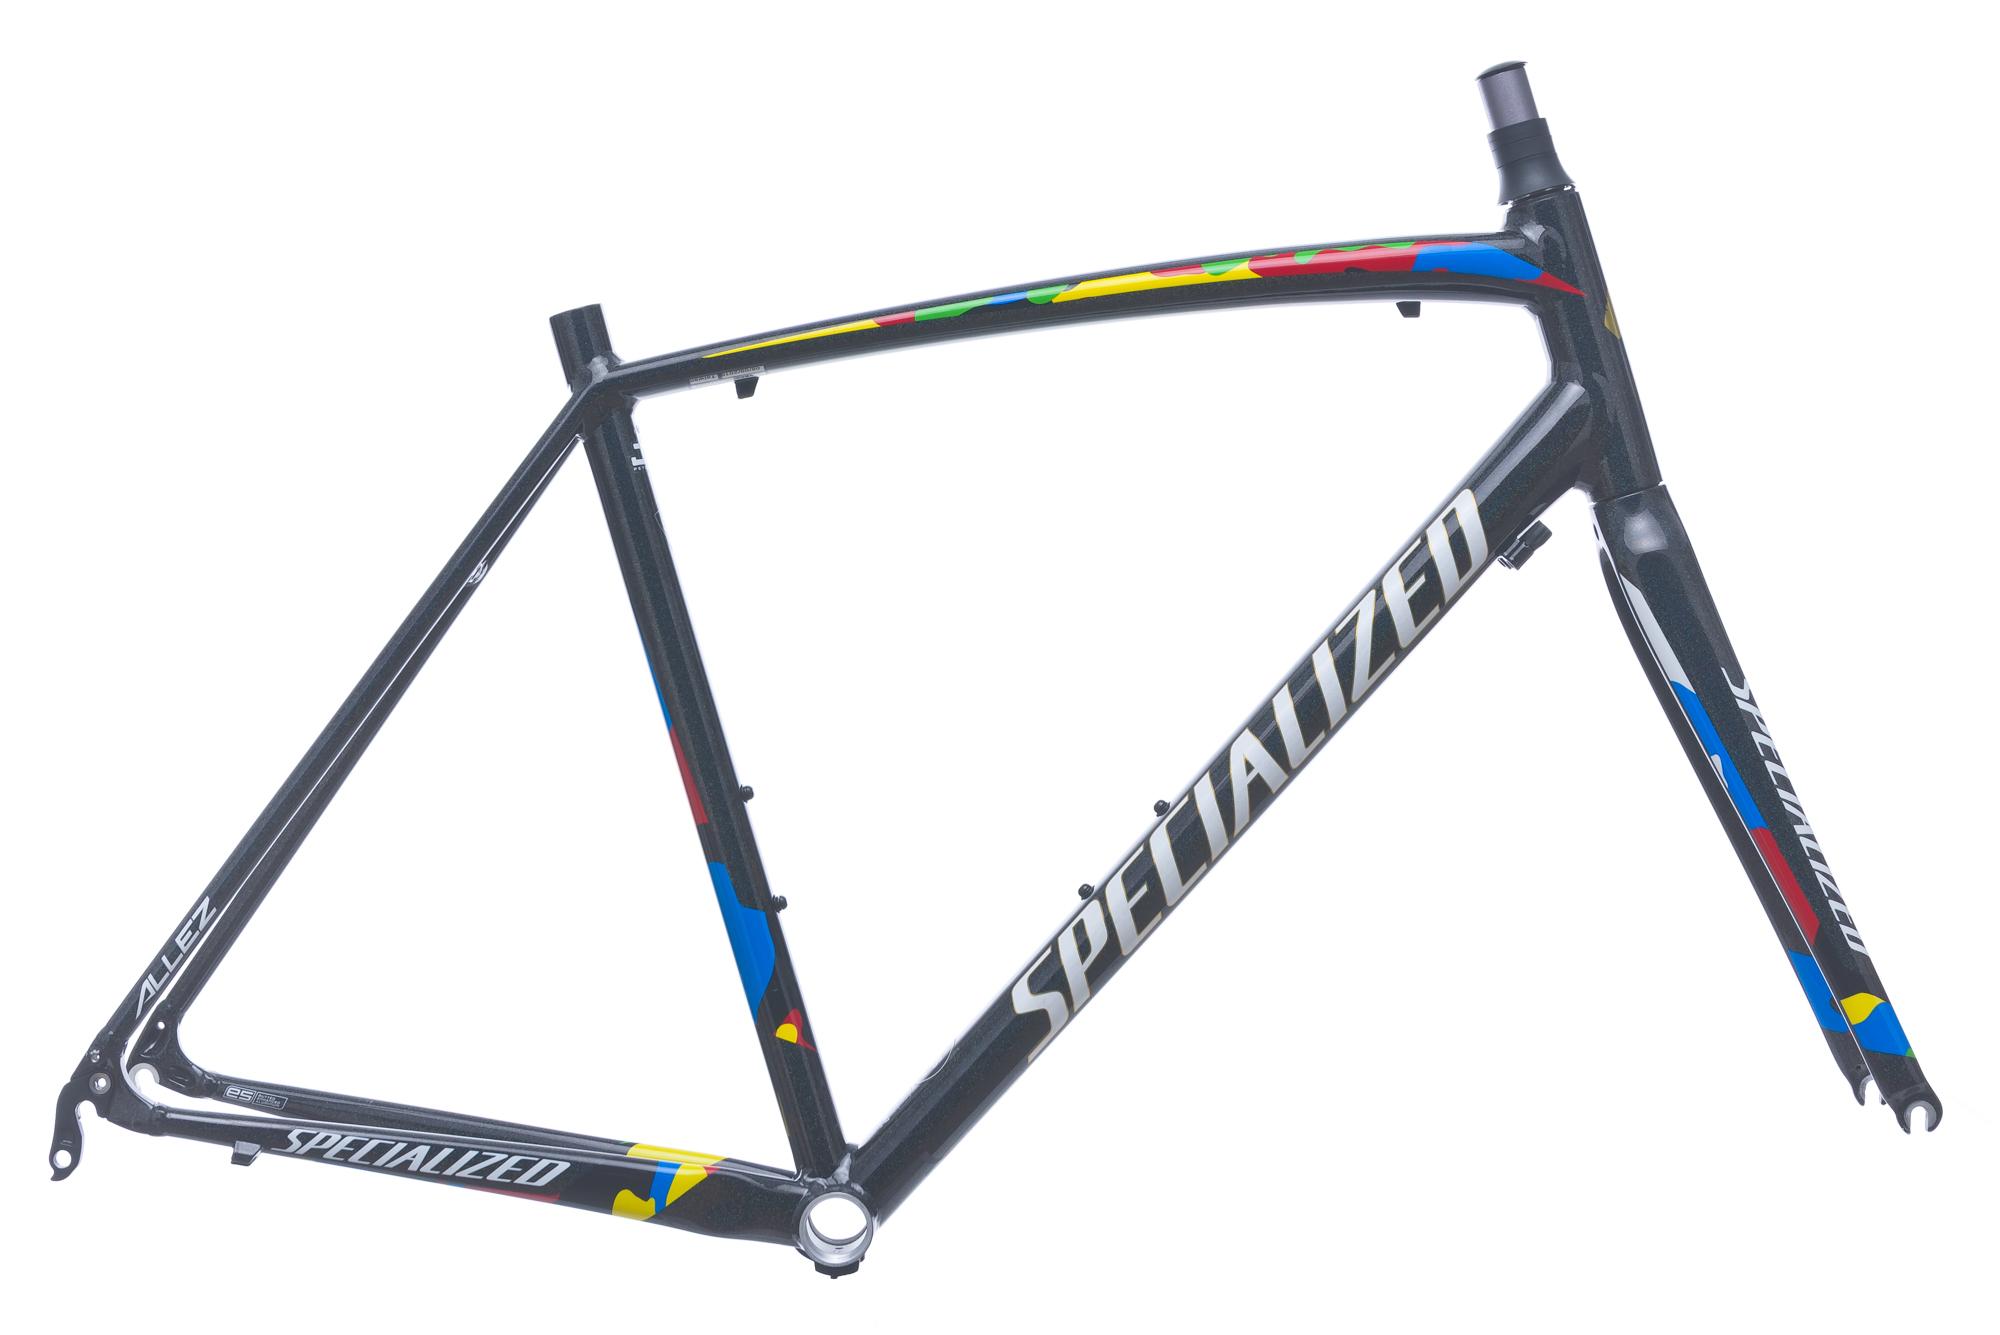 2017 Specialized Allez E5 Elite Sagan Edition Road Bike Frame Set ...